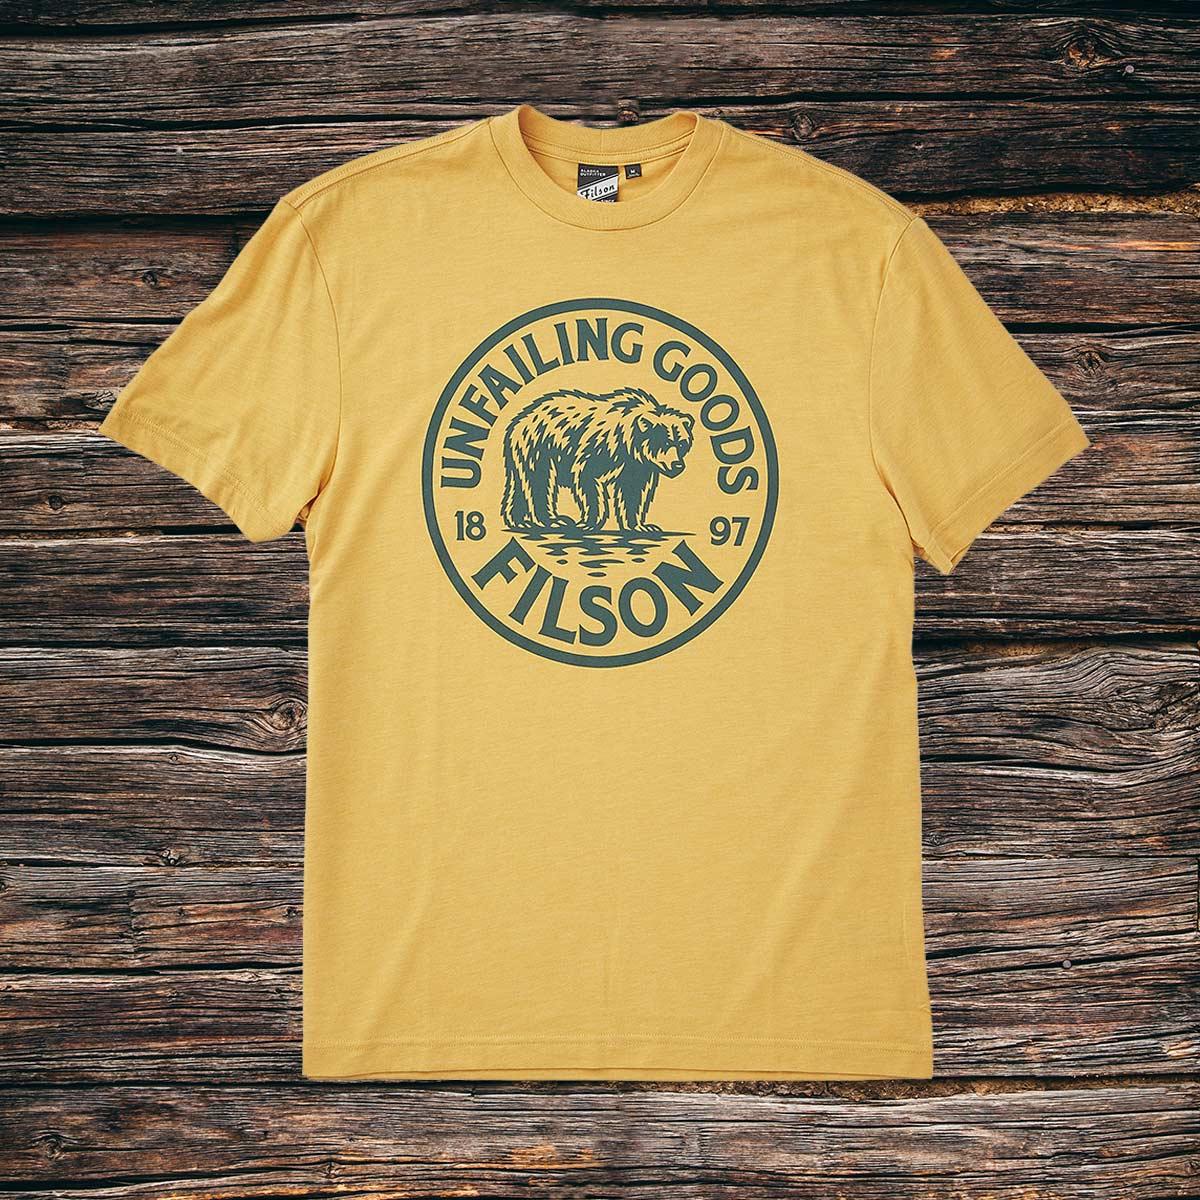 Filson Buckshot T-Shirt Rye, high performance T-shirt mit Sonnenschutz UPF 50+